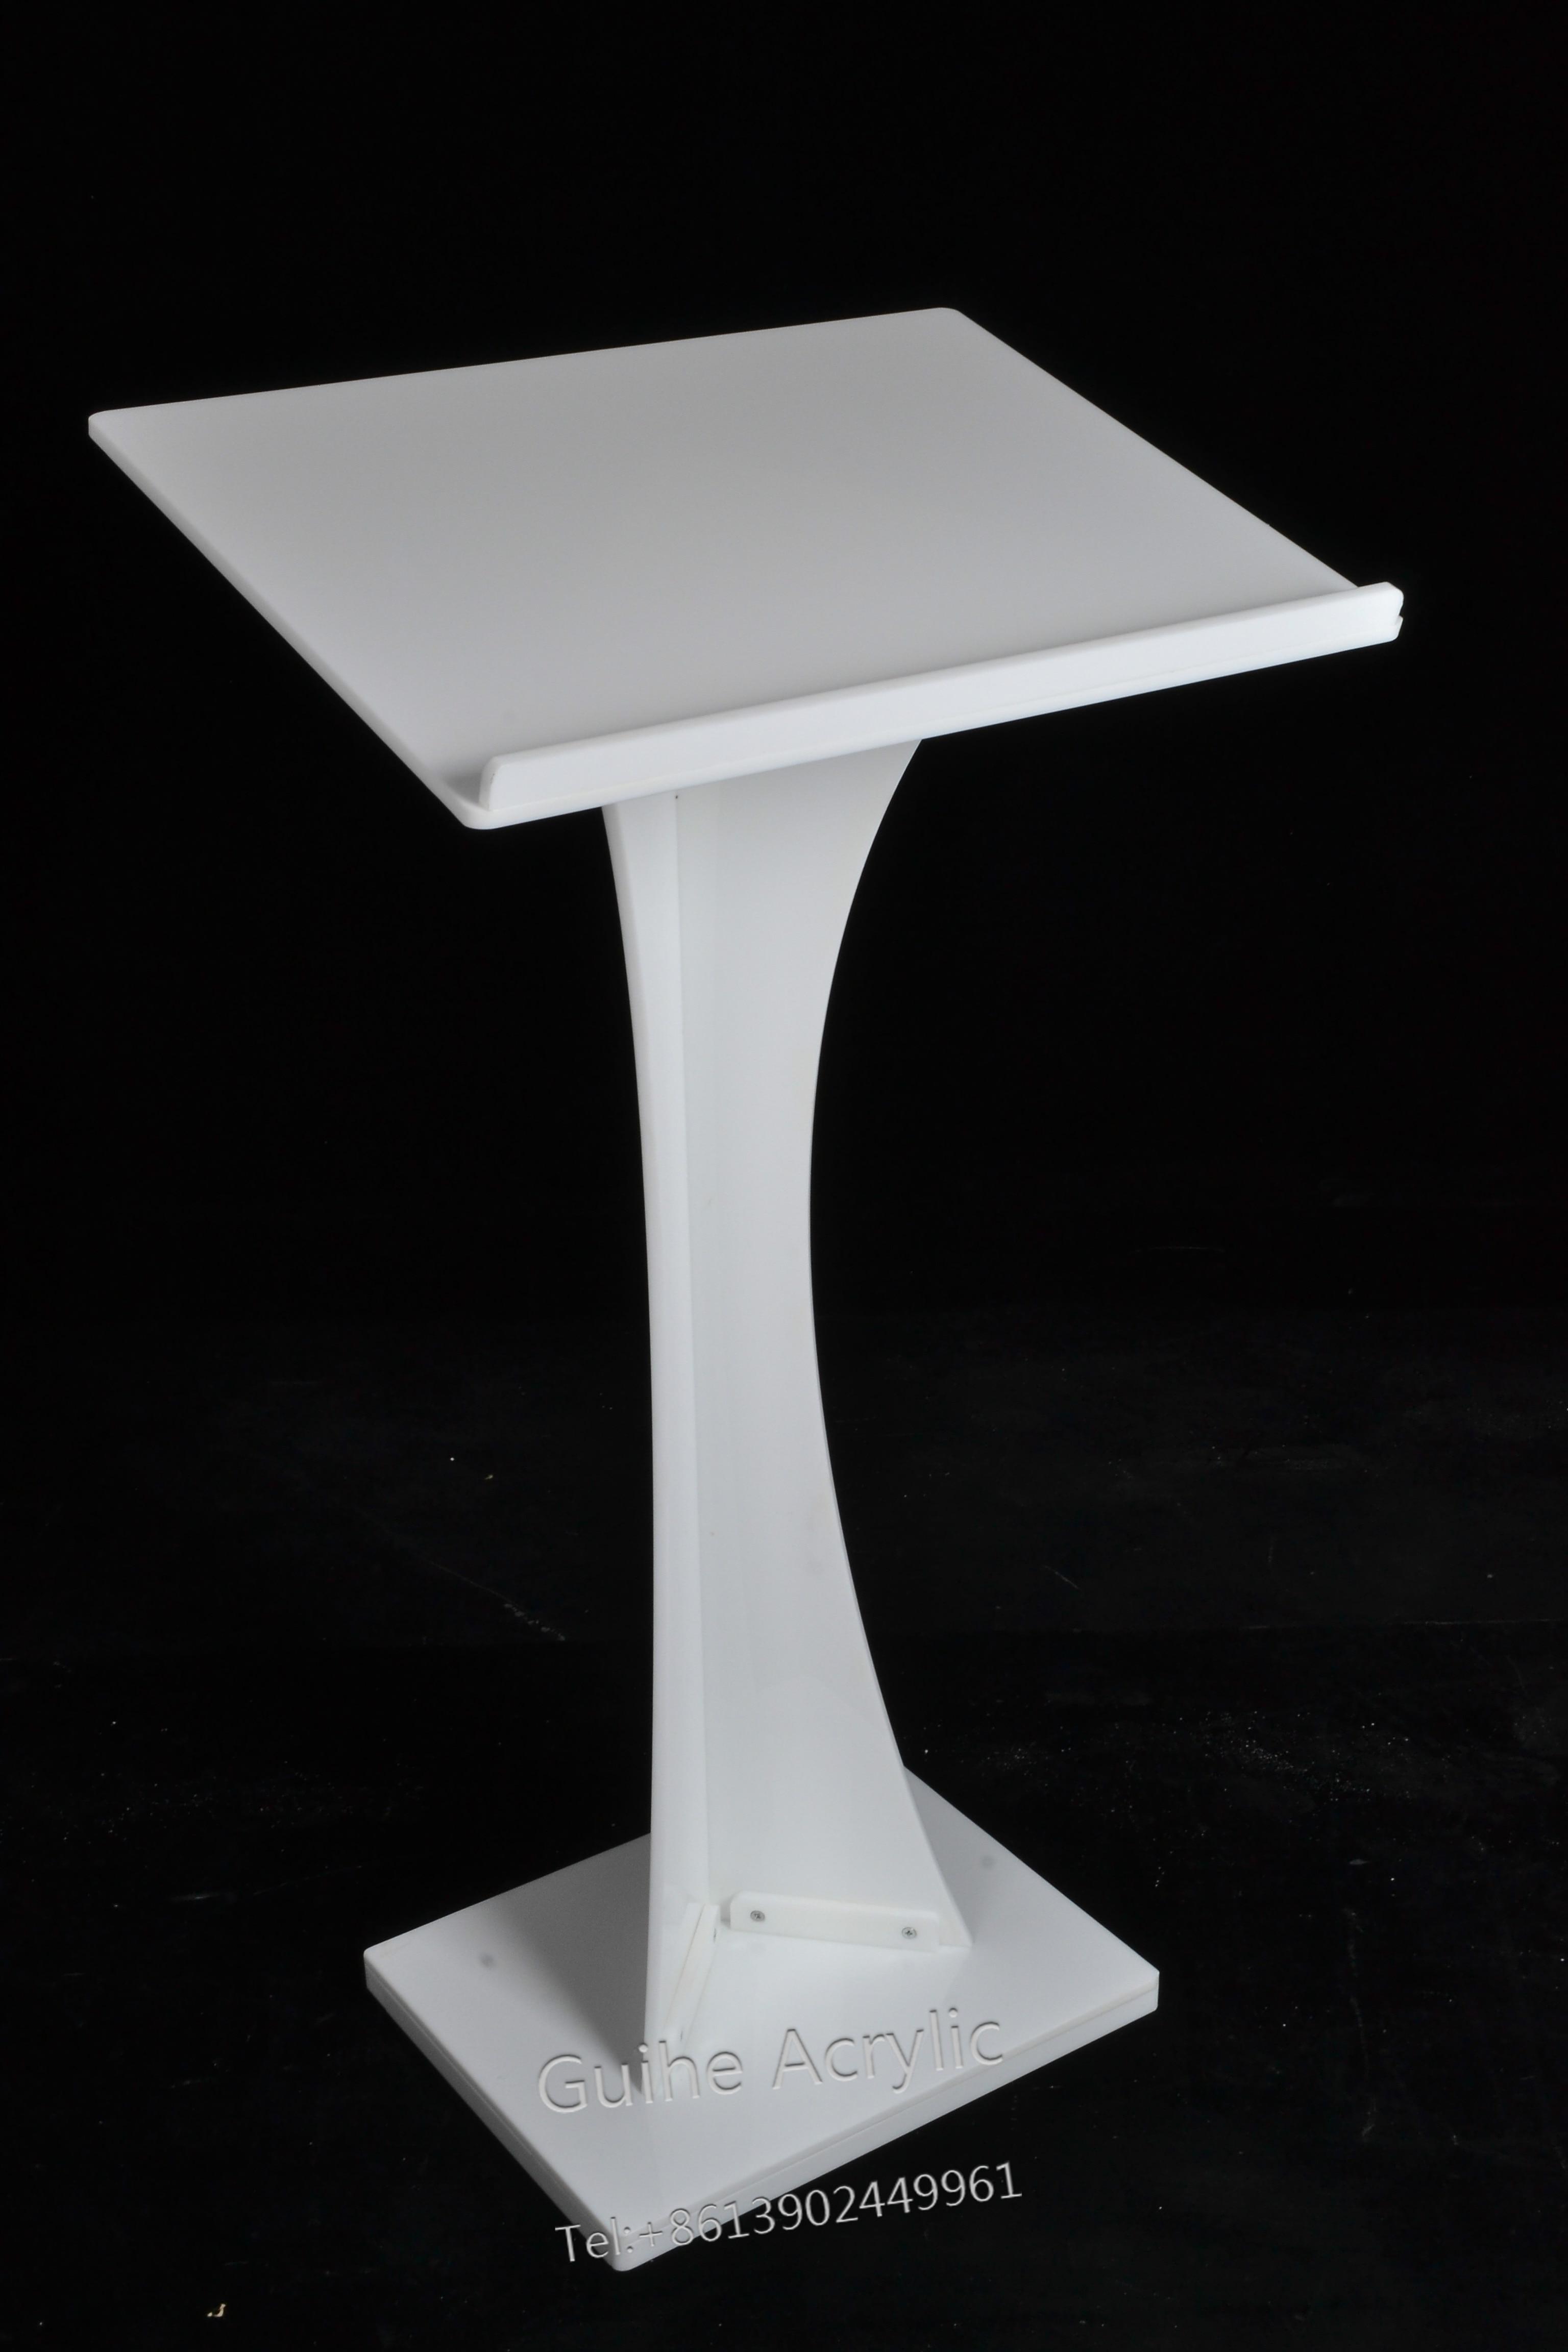 GUIHEYUN White Acrylic Stand Up Lecture Business Church Podium Lectern